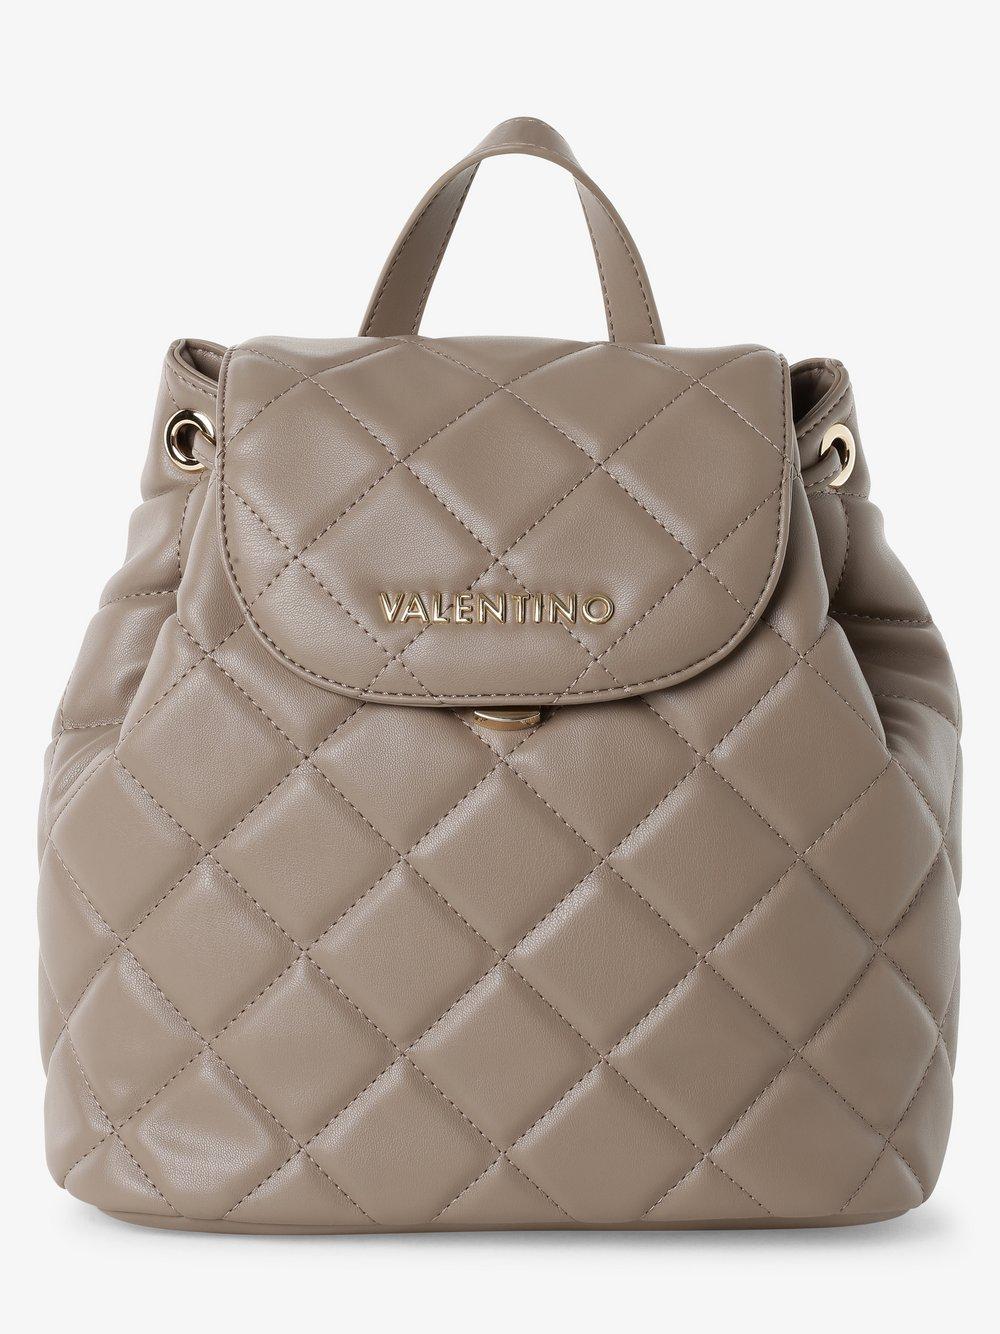 VALENTINO HANDBAGS – Plecak damski – Ocarina, beżowy Van Graaf 486488-0001